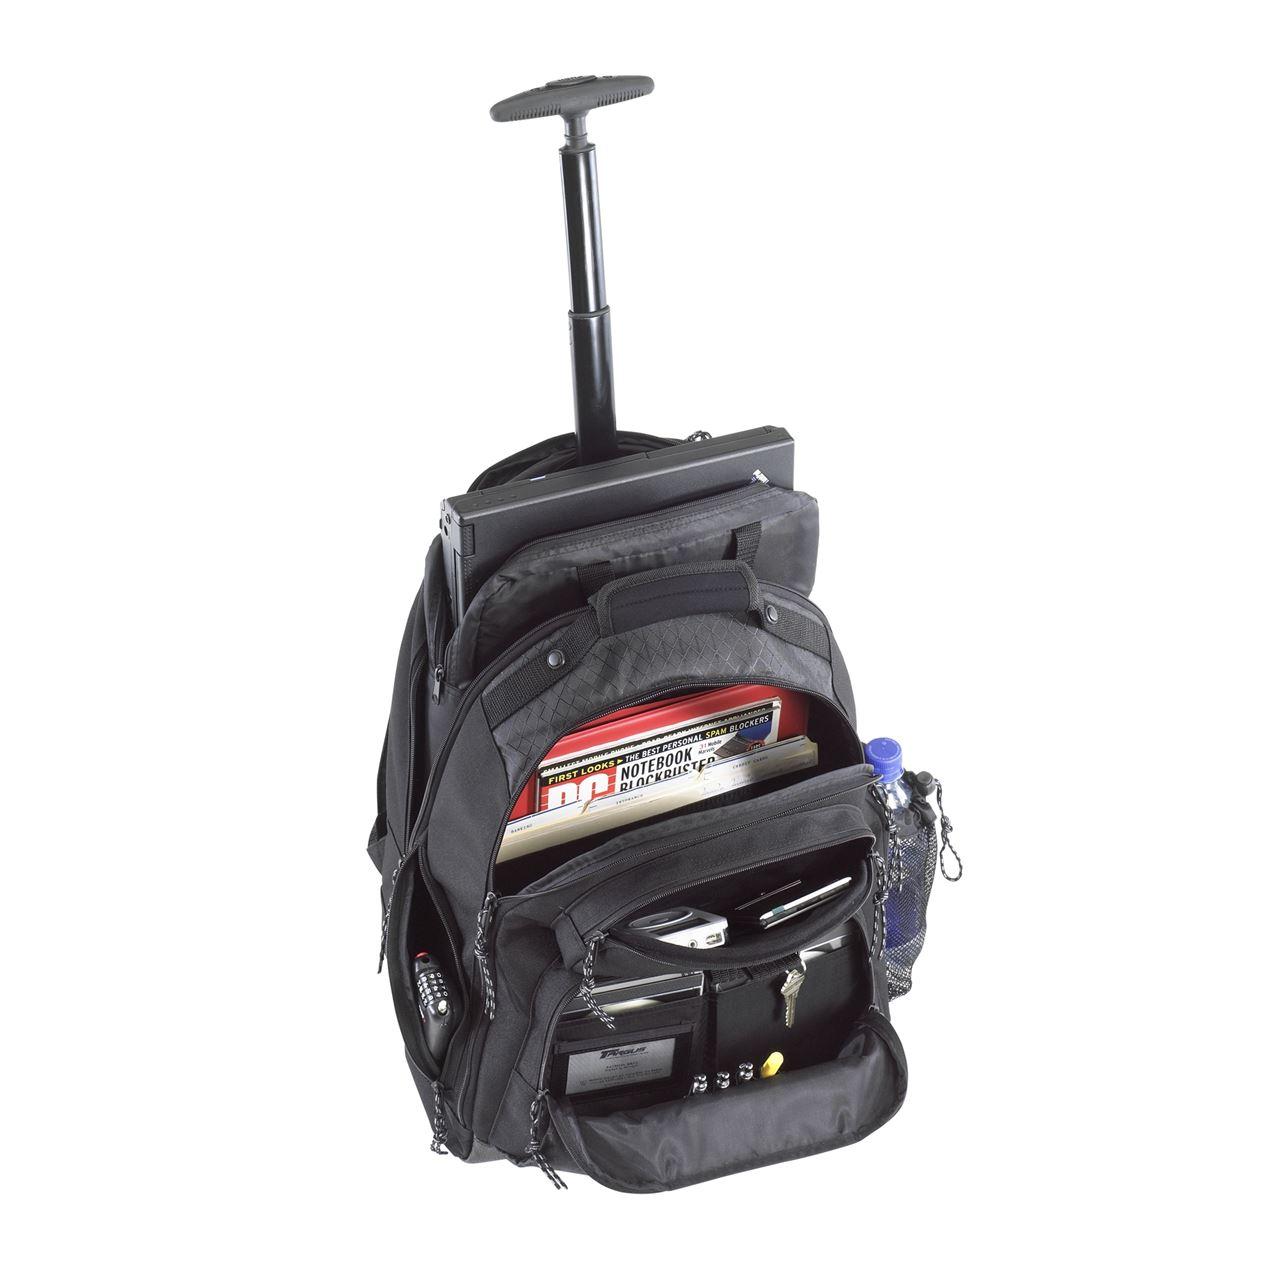 15.4u201d Rolling Laptop Backpack - TSB700 - Black Rollers Targus